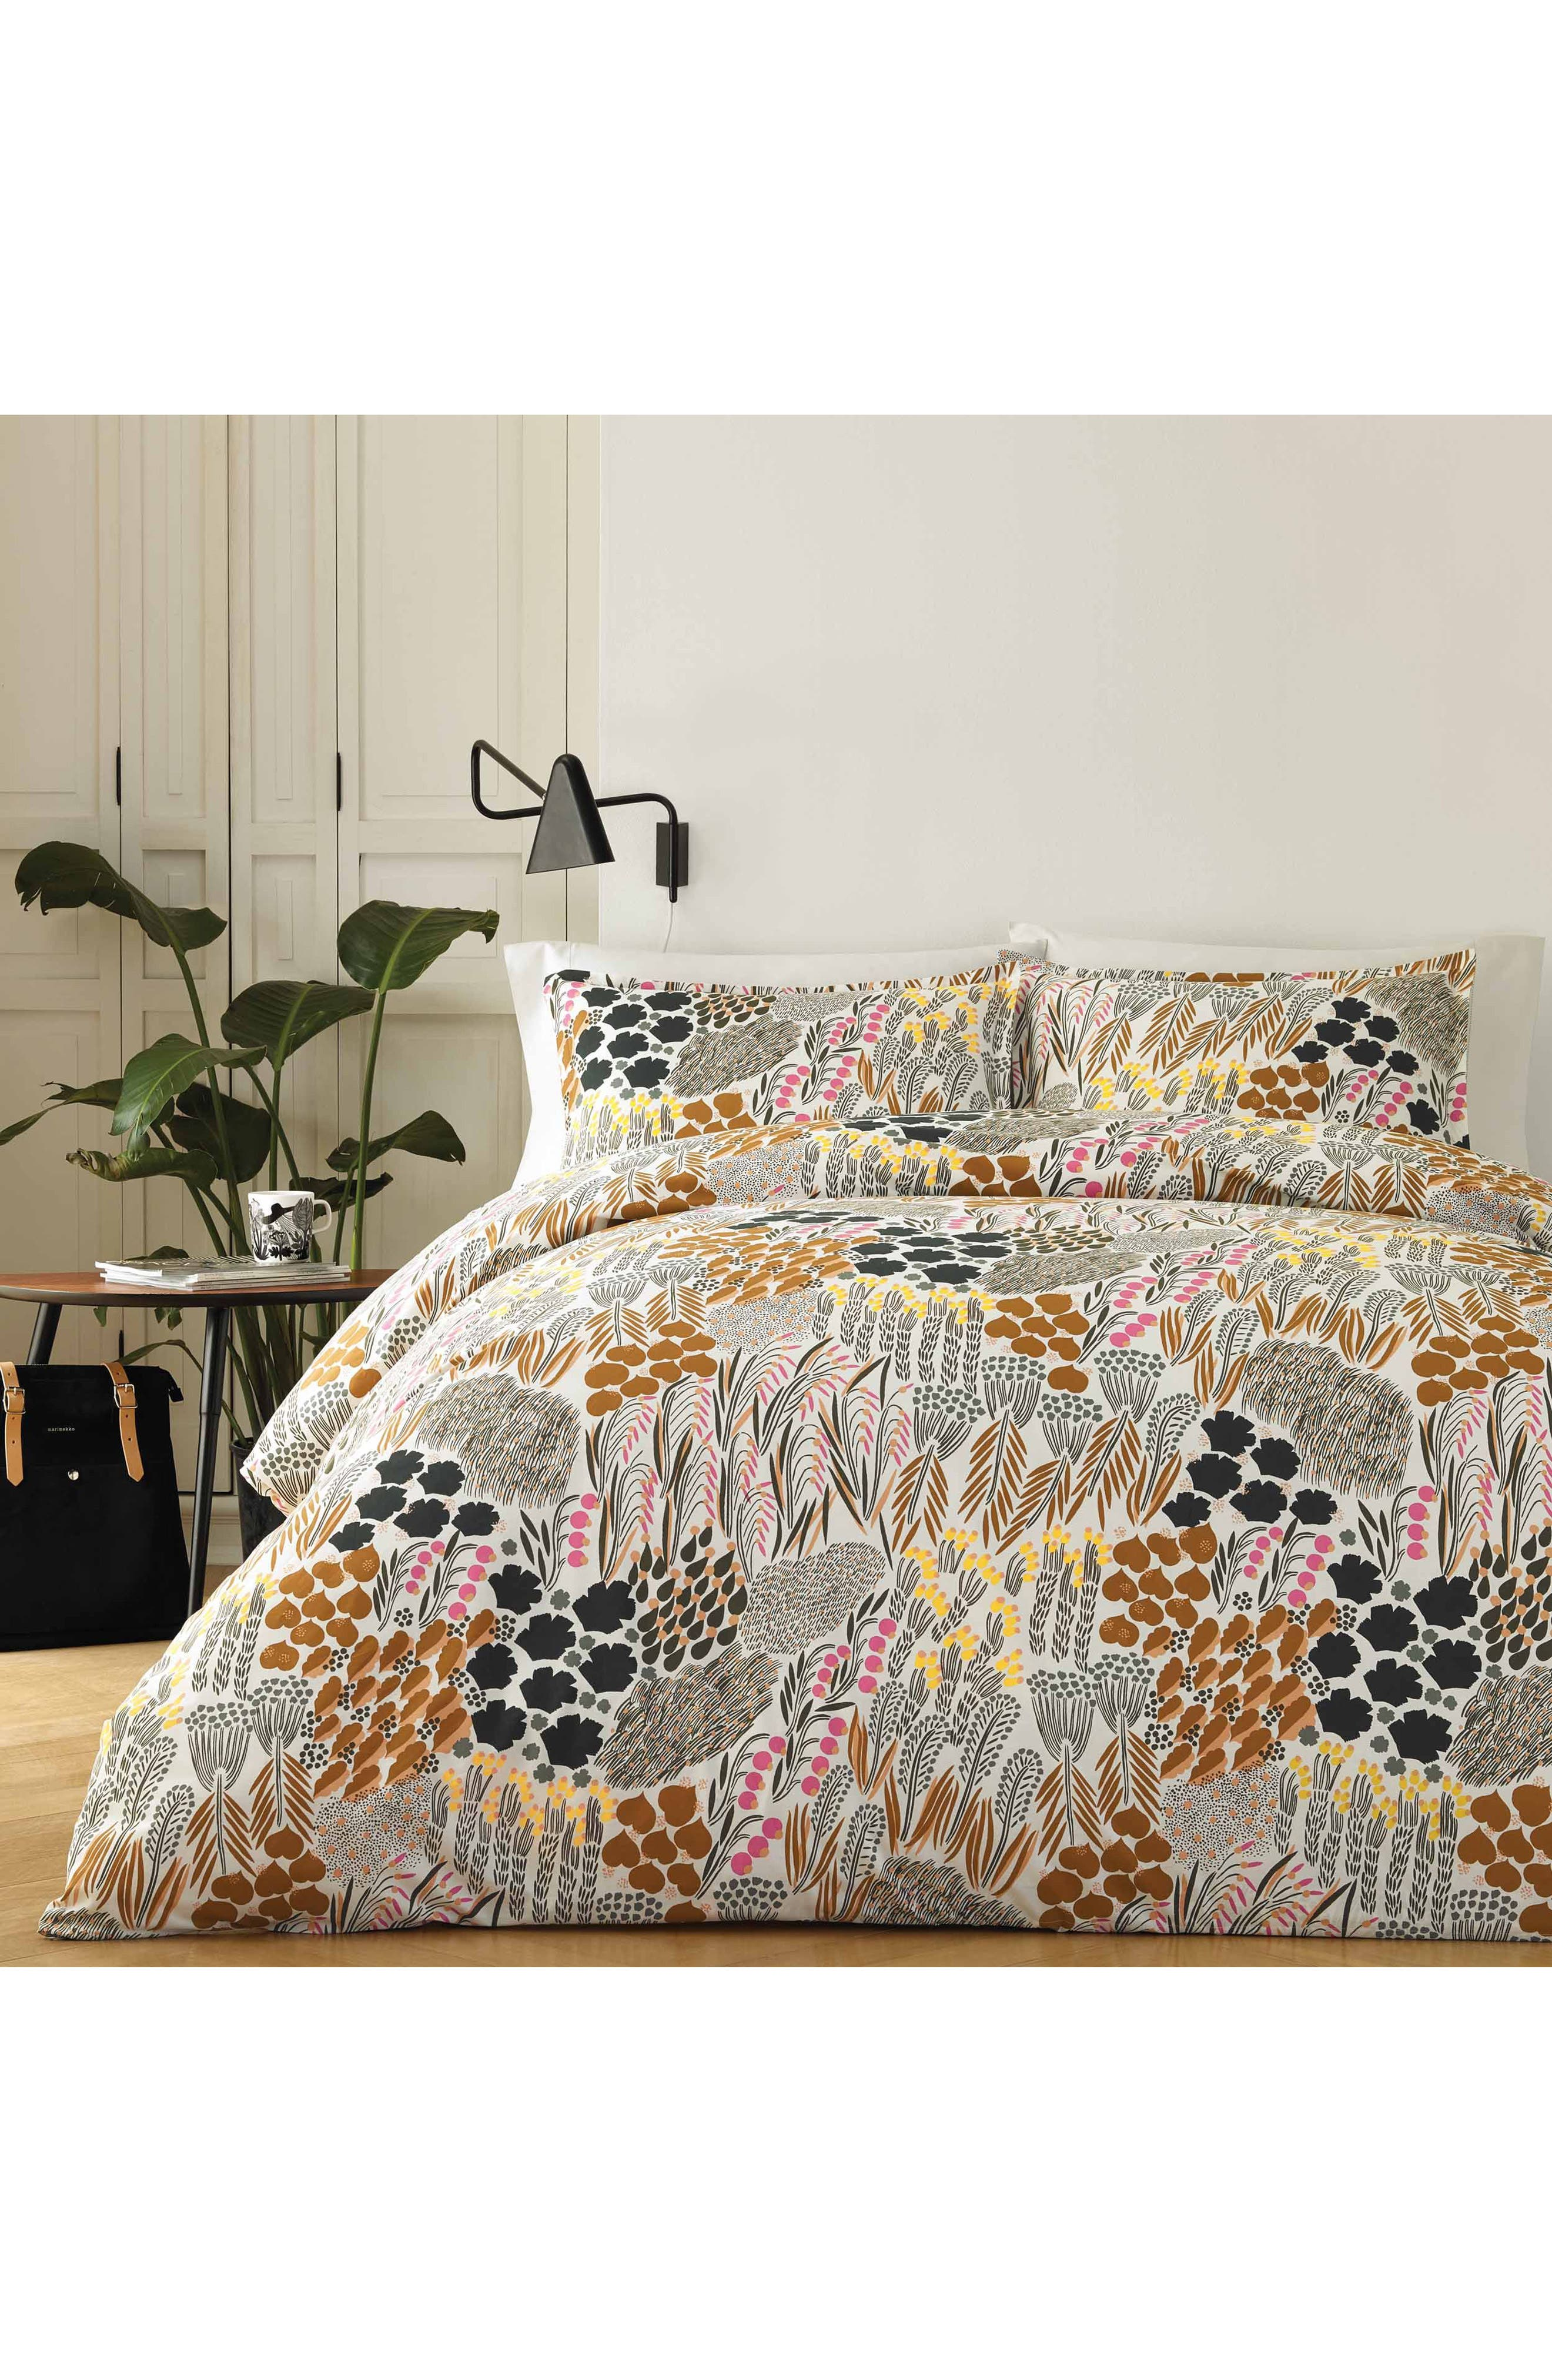 Main Image - Marimekko Pieni Letto Comforter & Sham Set